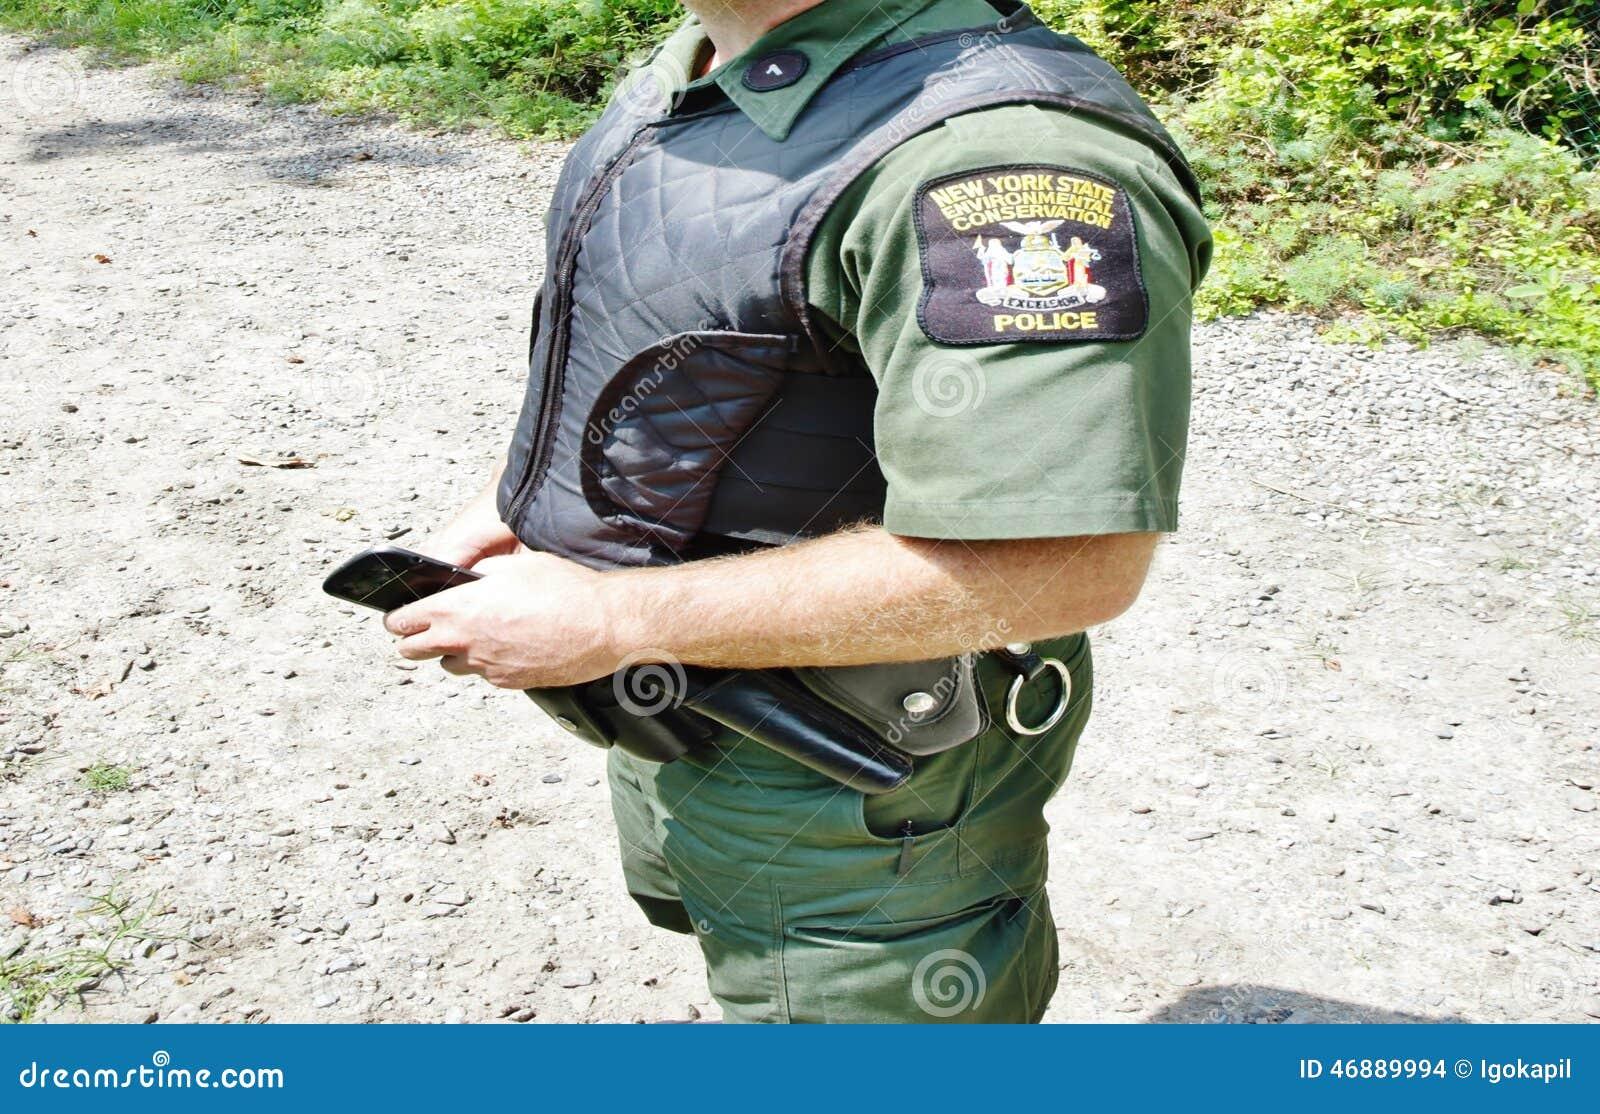 new york enviromental concervation officer uniform stock photo